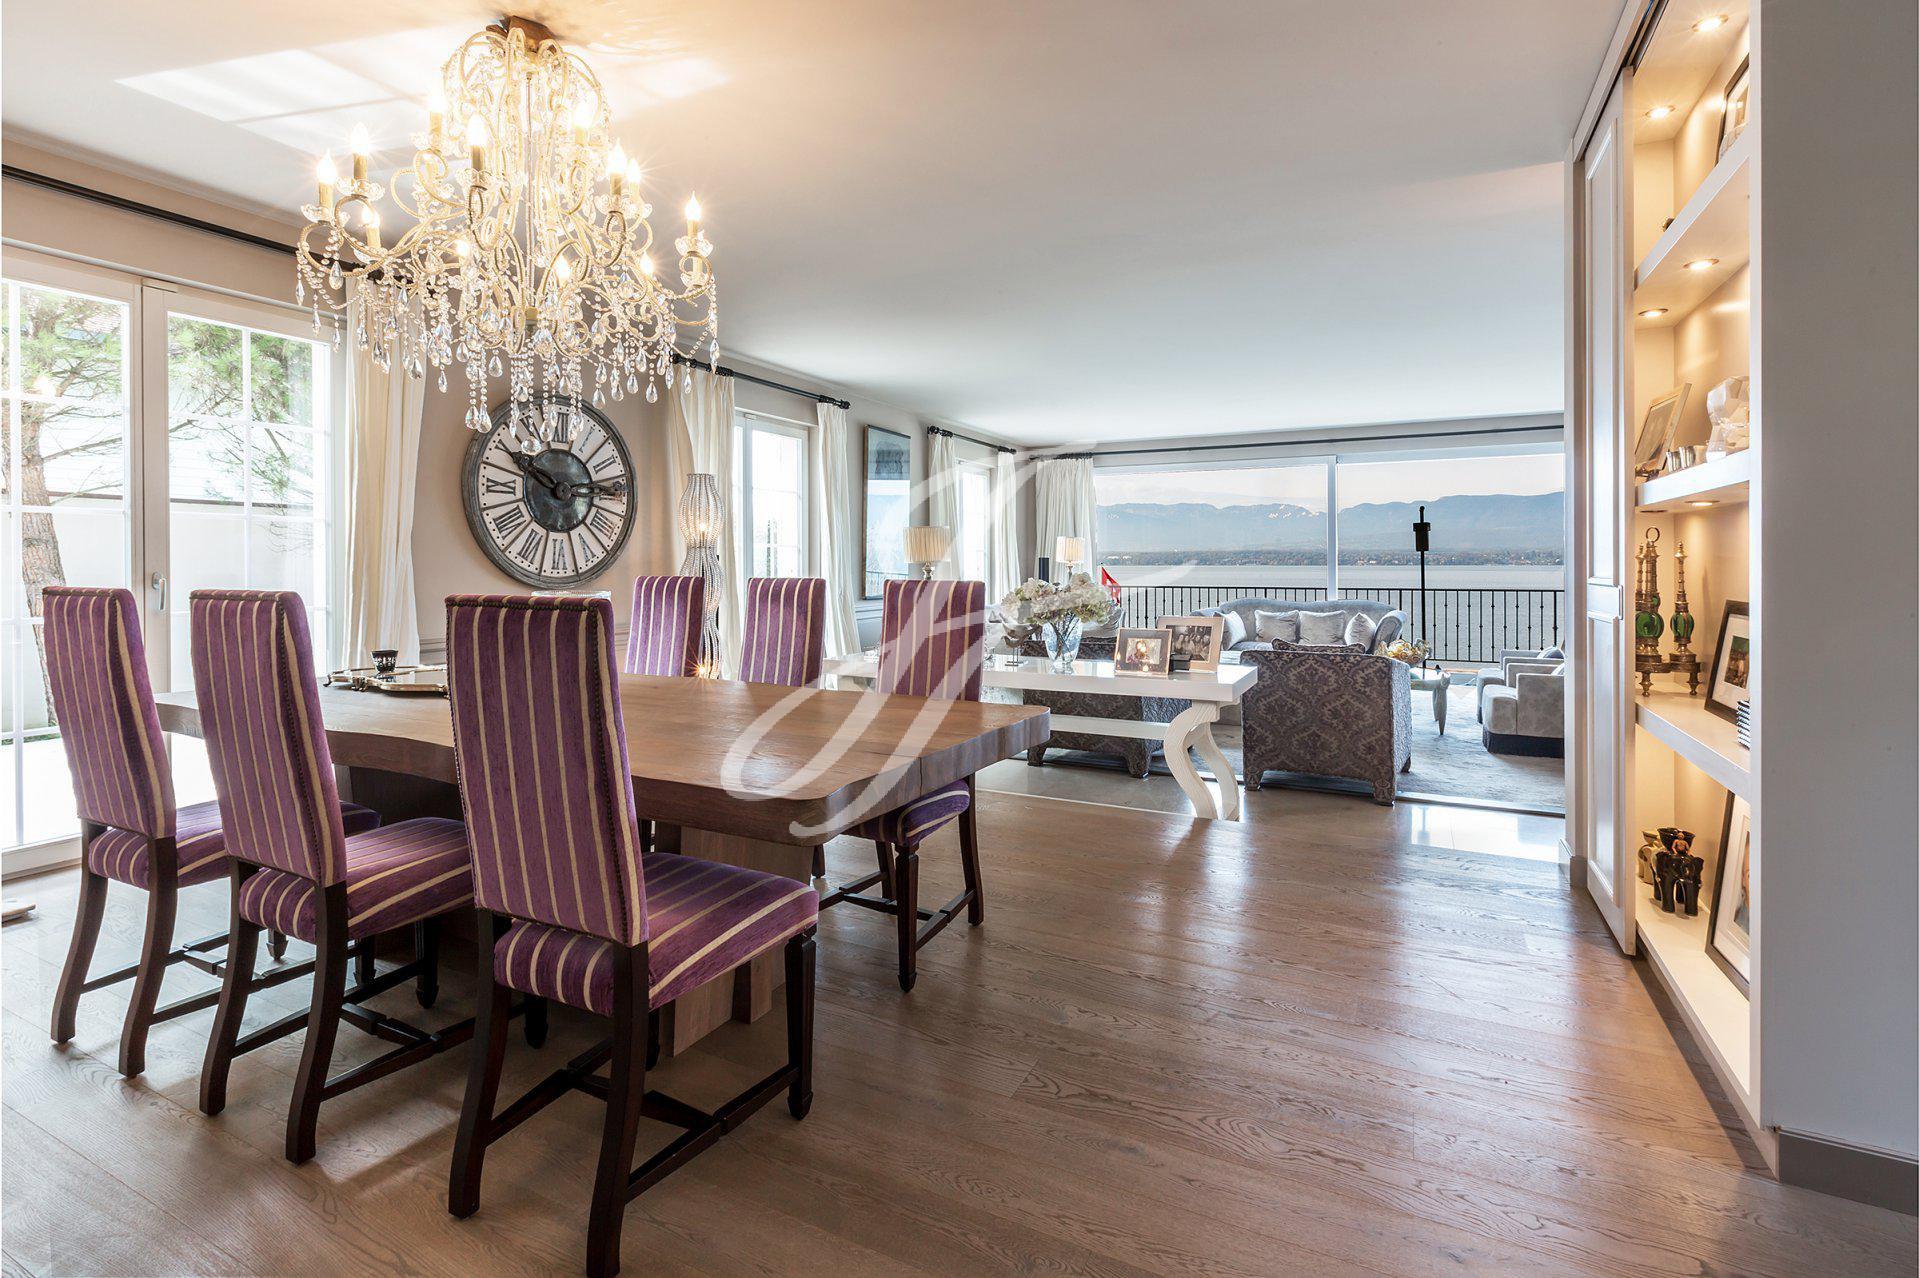 Luxury Waterfront Property For Sale in Geneva Left Bank, Switzerland |John Taylor Switzerland | FINEST RESIDENCES